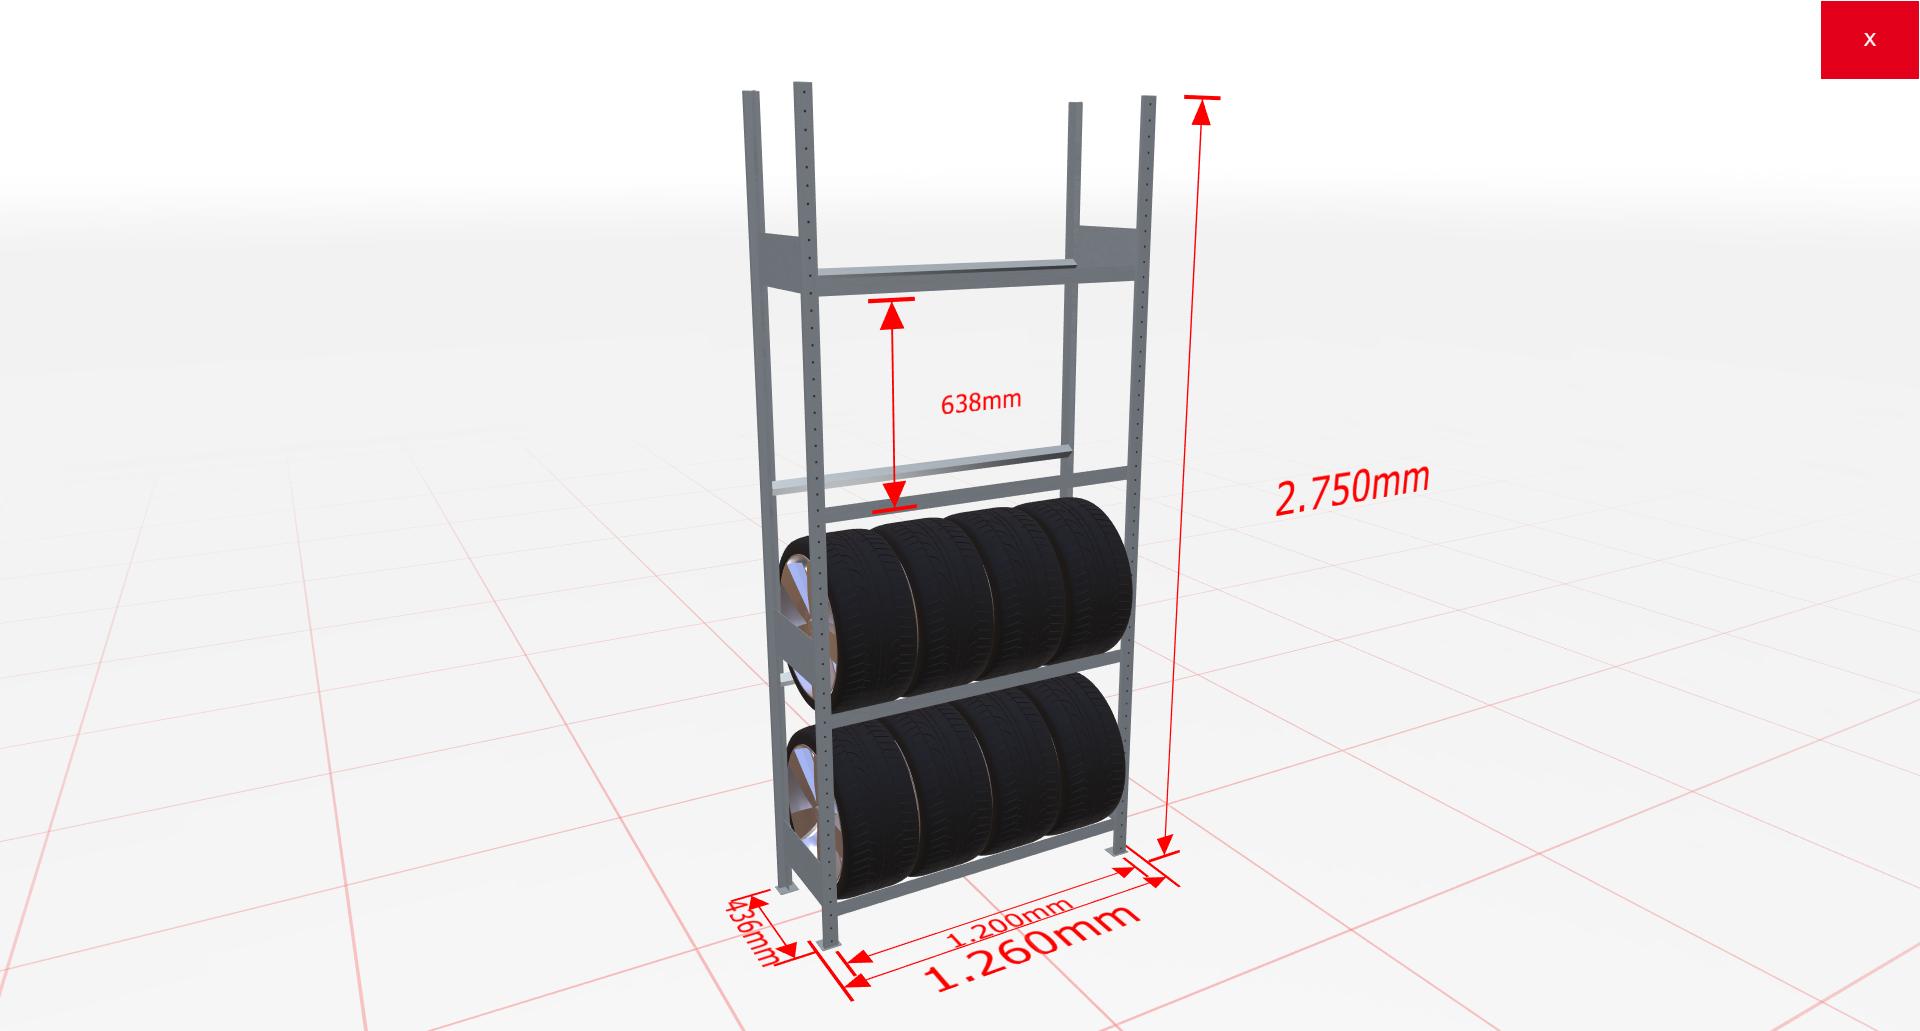 Räderregal Grundregal SCHULTE Lagertechnik 2750x1200x400 mm – 4 Ebenen á 1200 mm, verzinkt